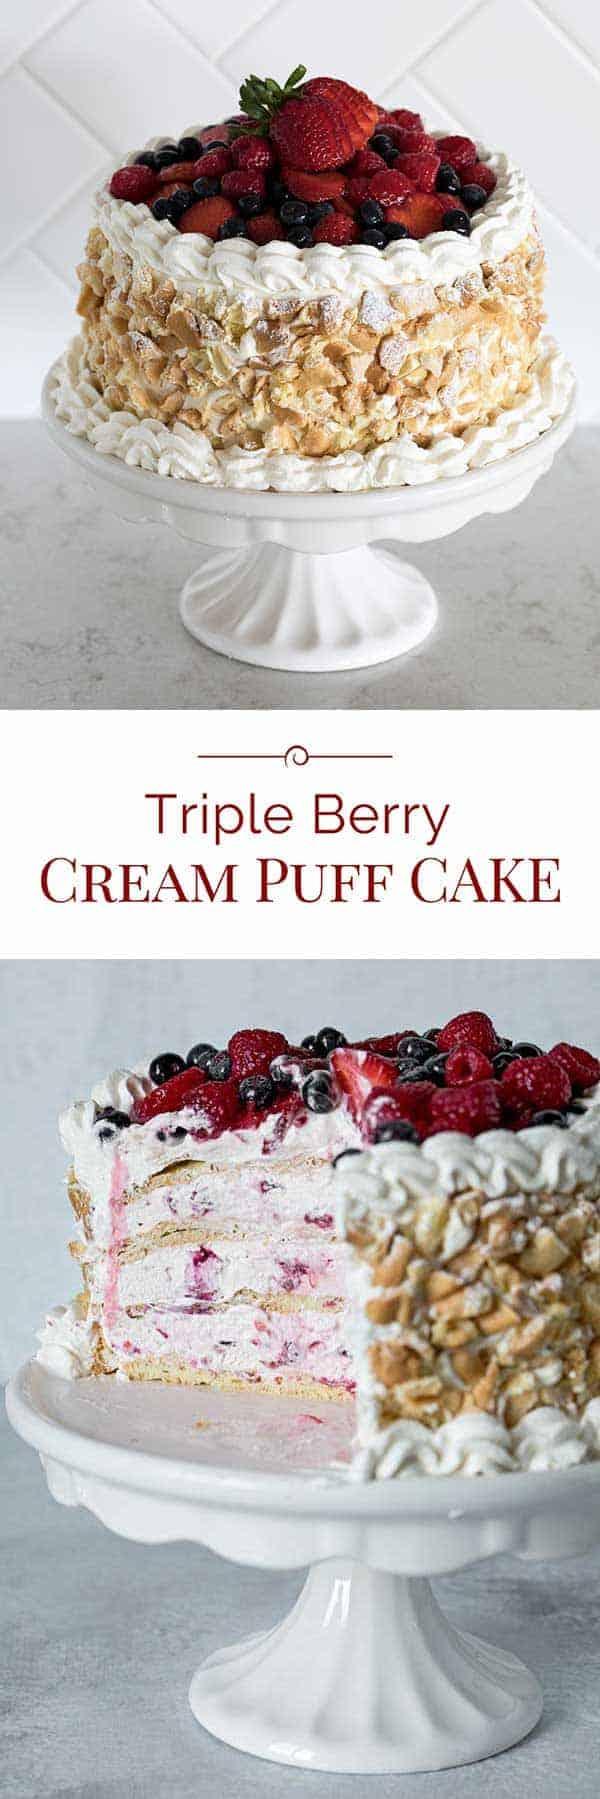 Triple-Berry-Cream-Puff-Cake-Collage